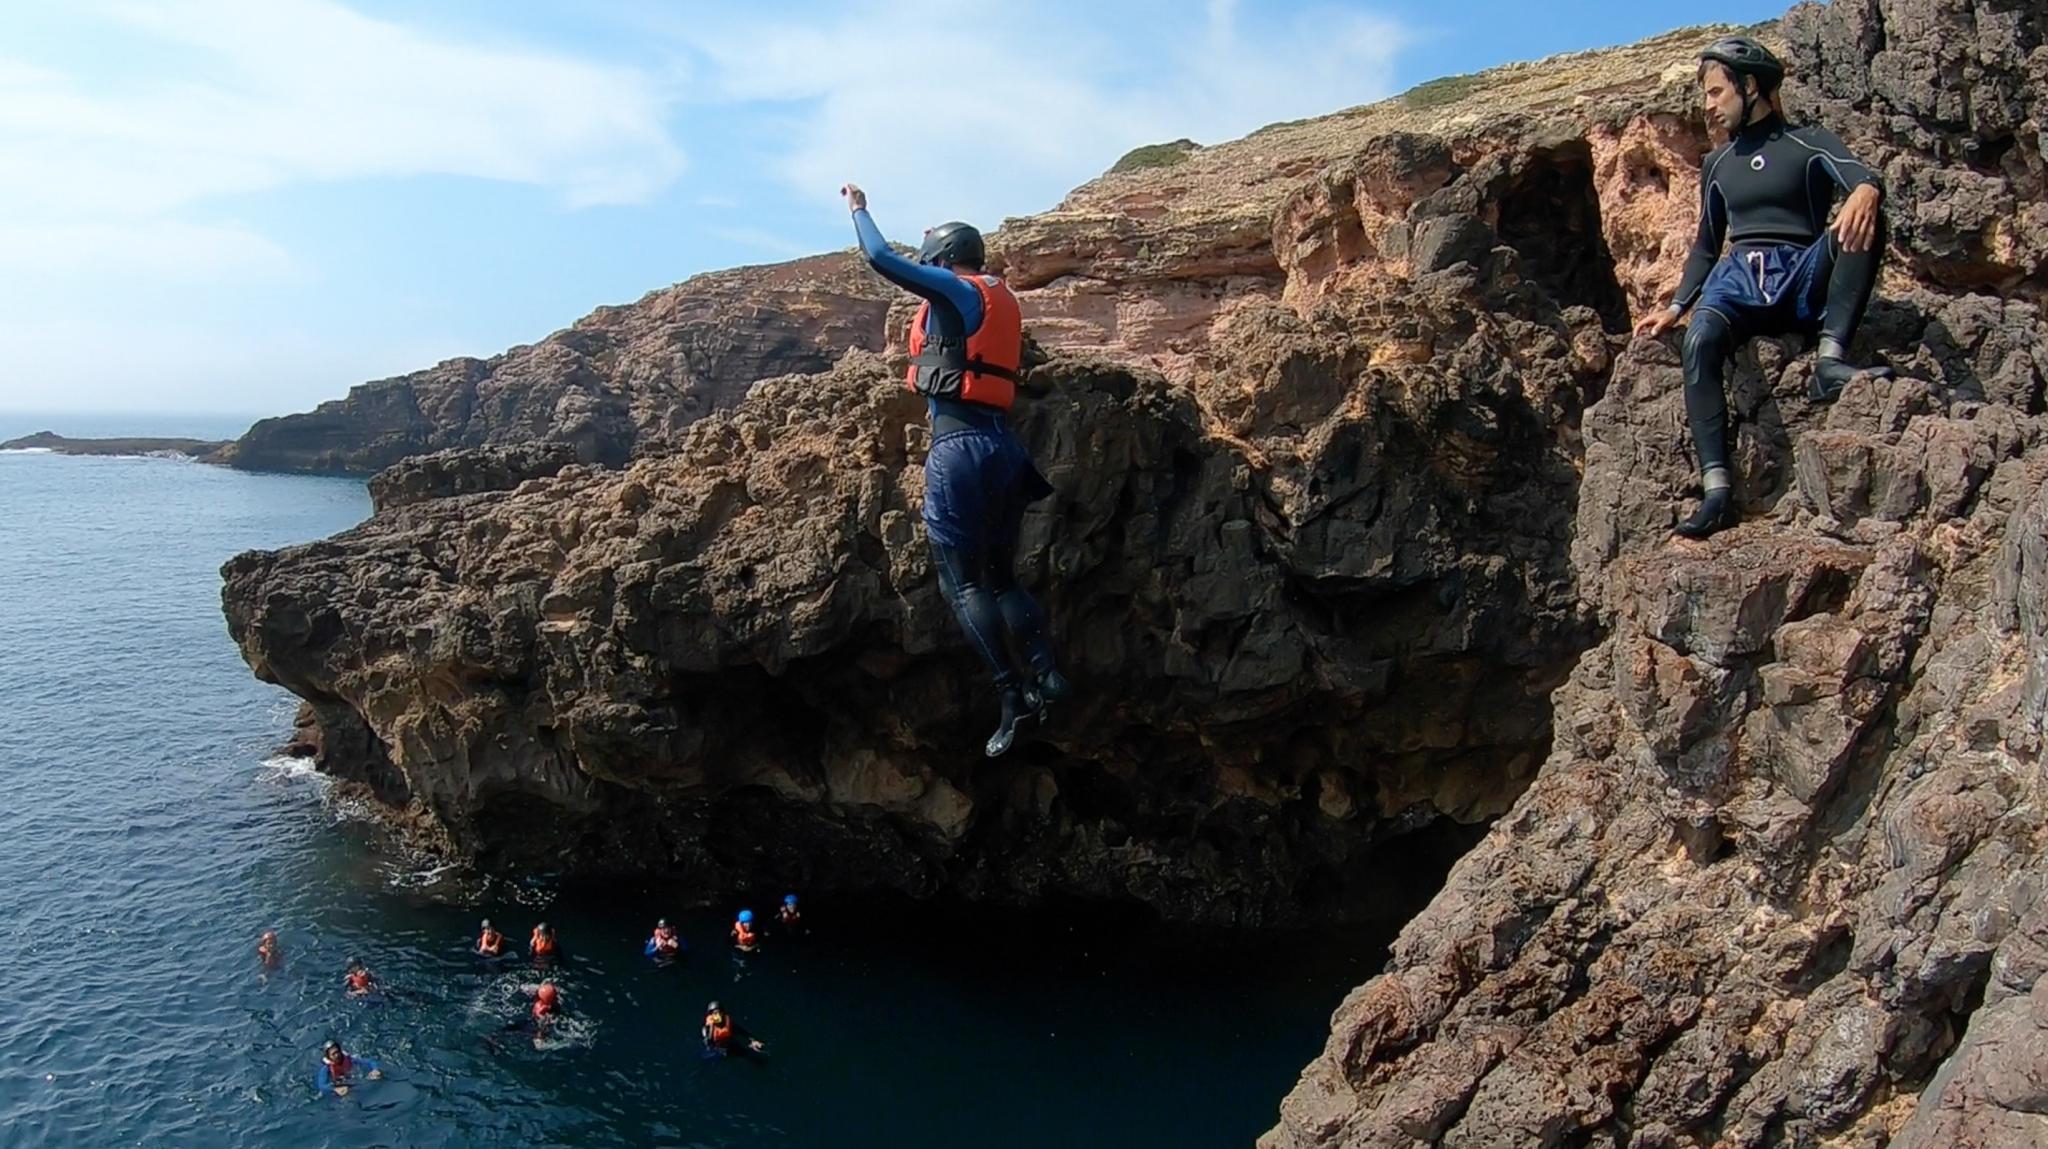 Coasteering in the Algarve!